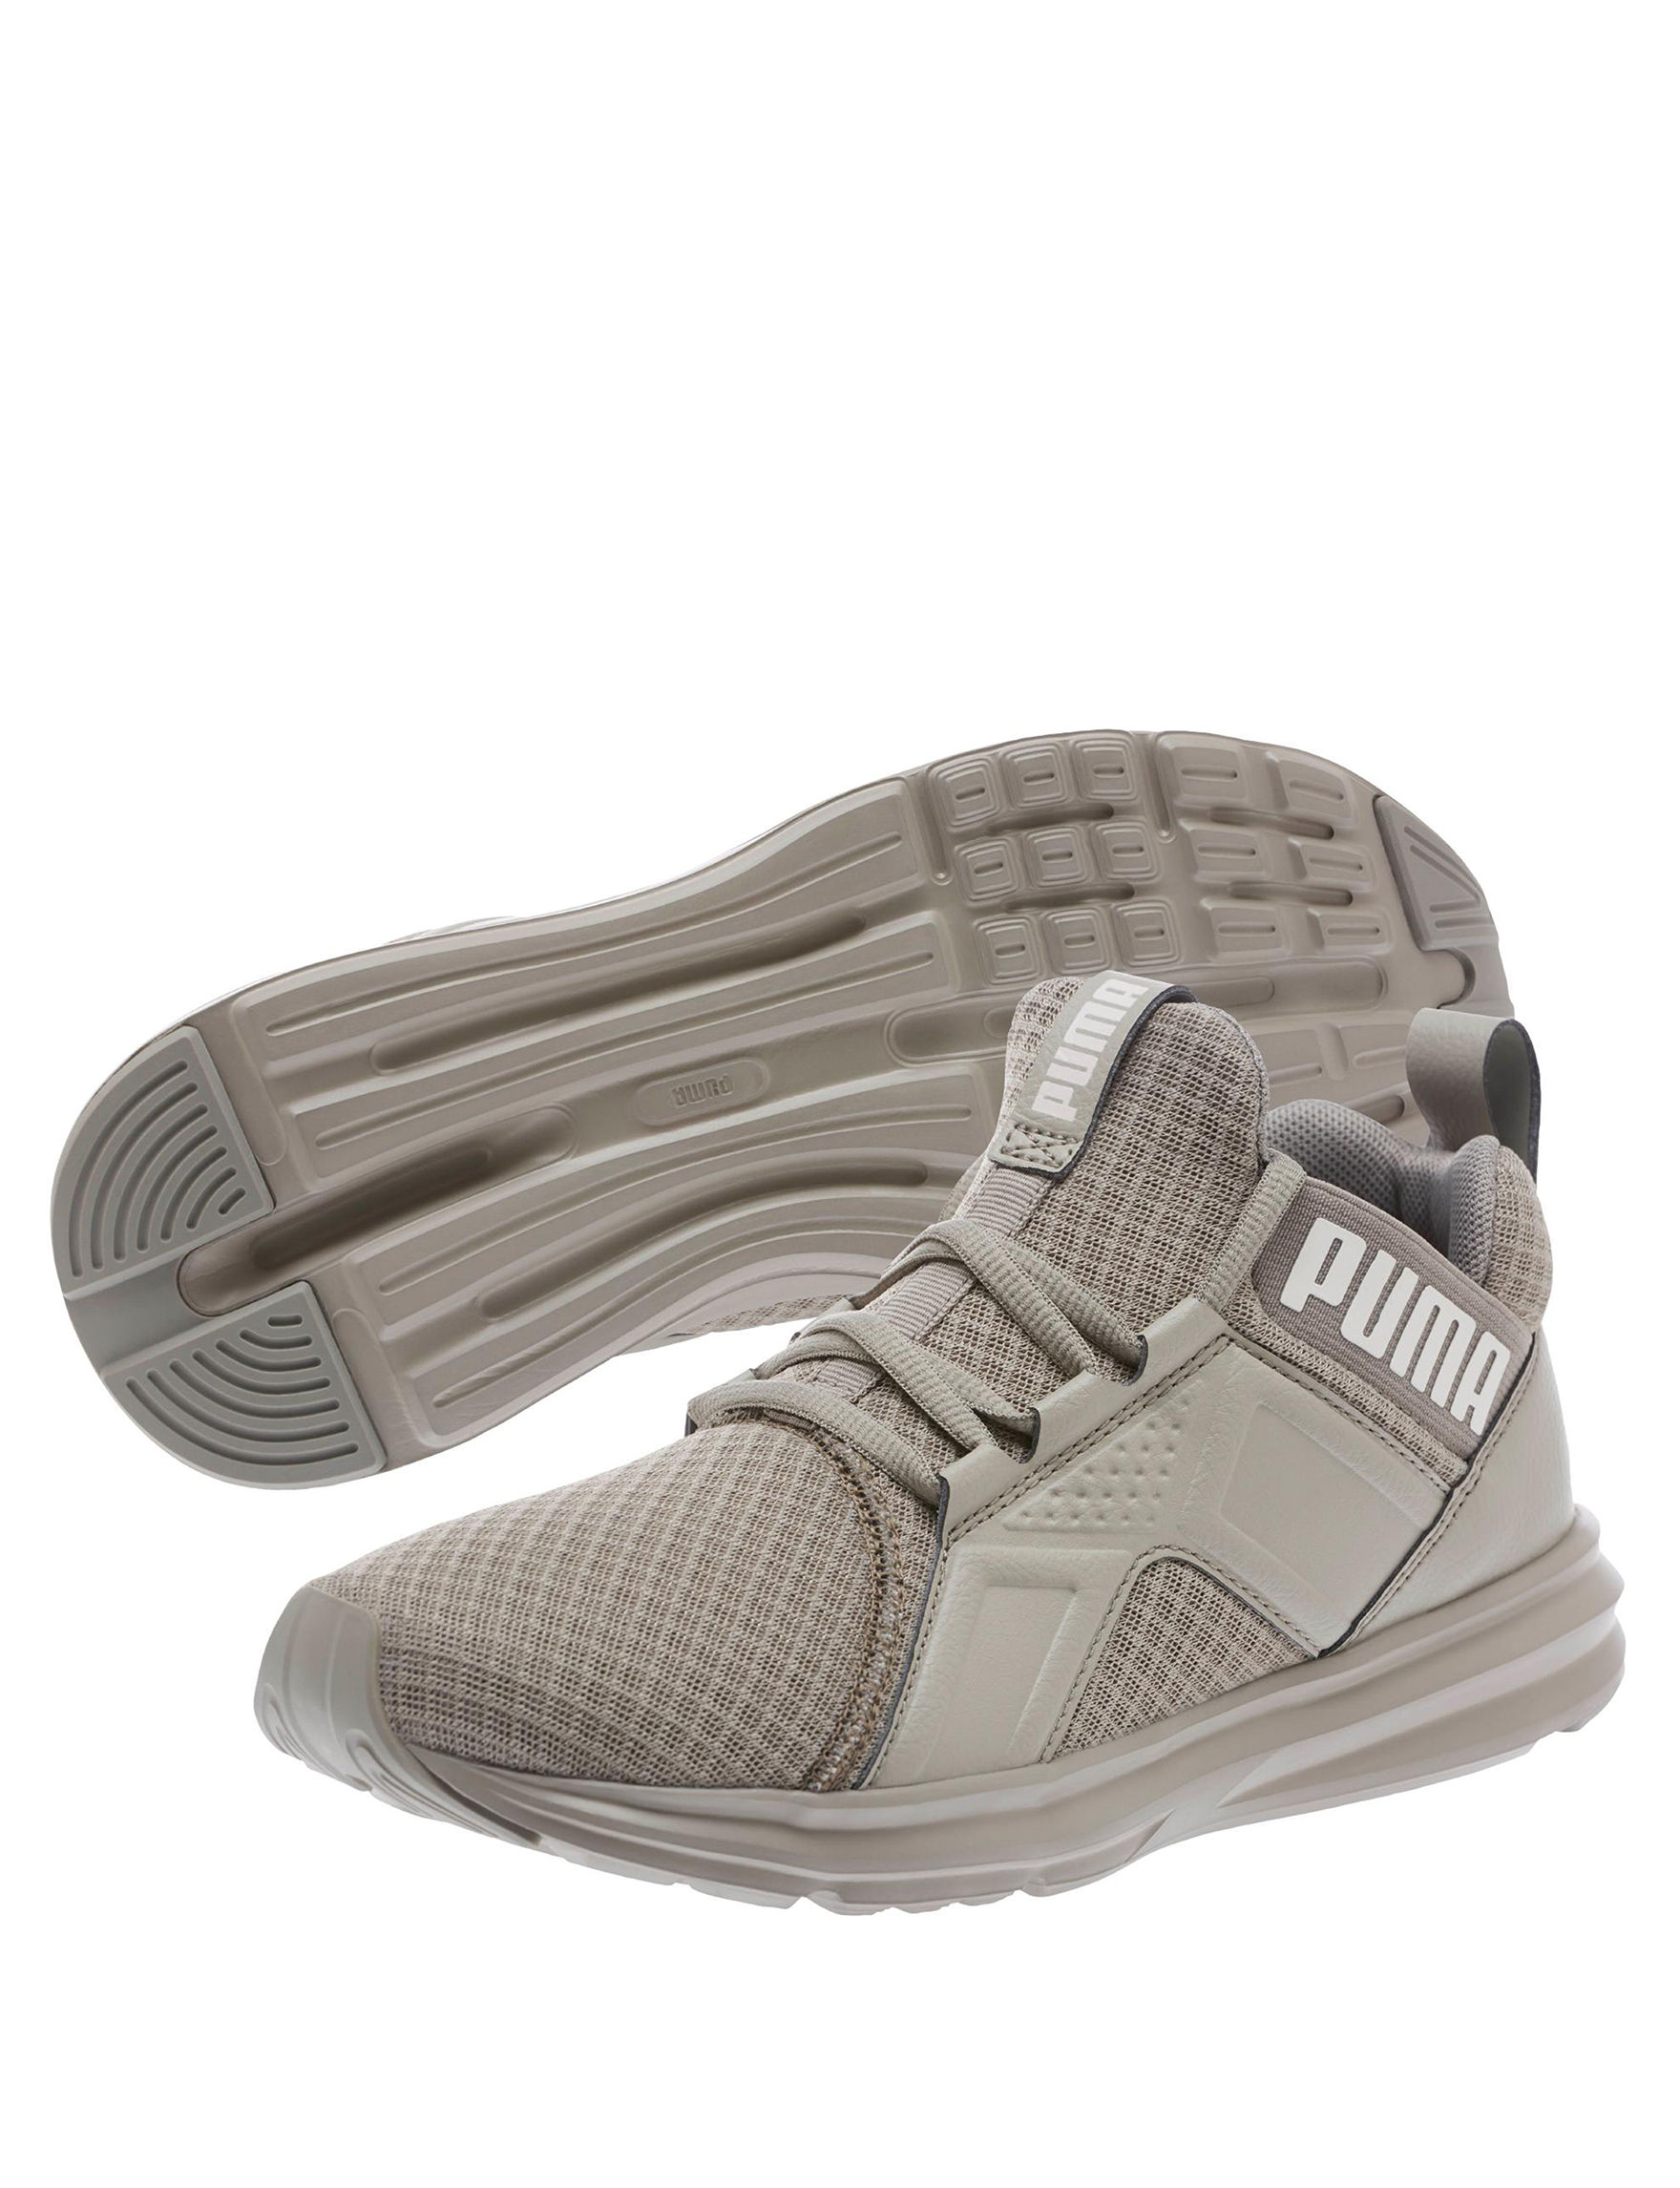 Puma Light Brown Comfort Shoes